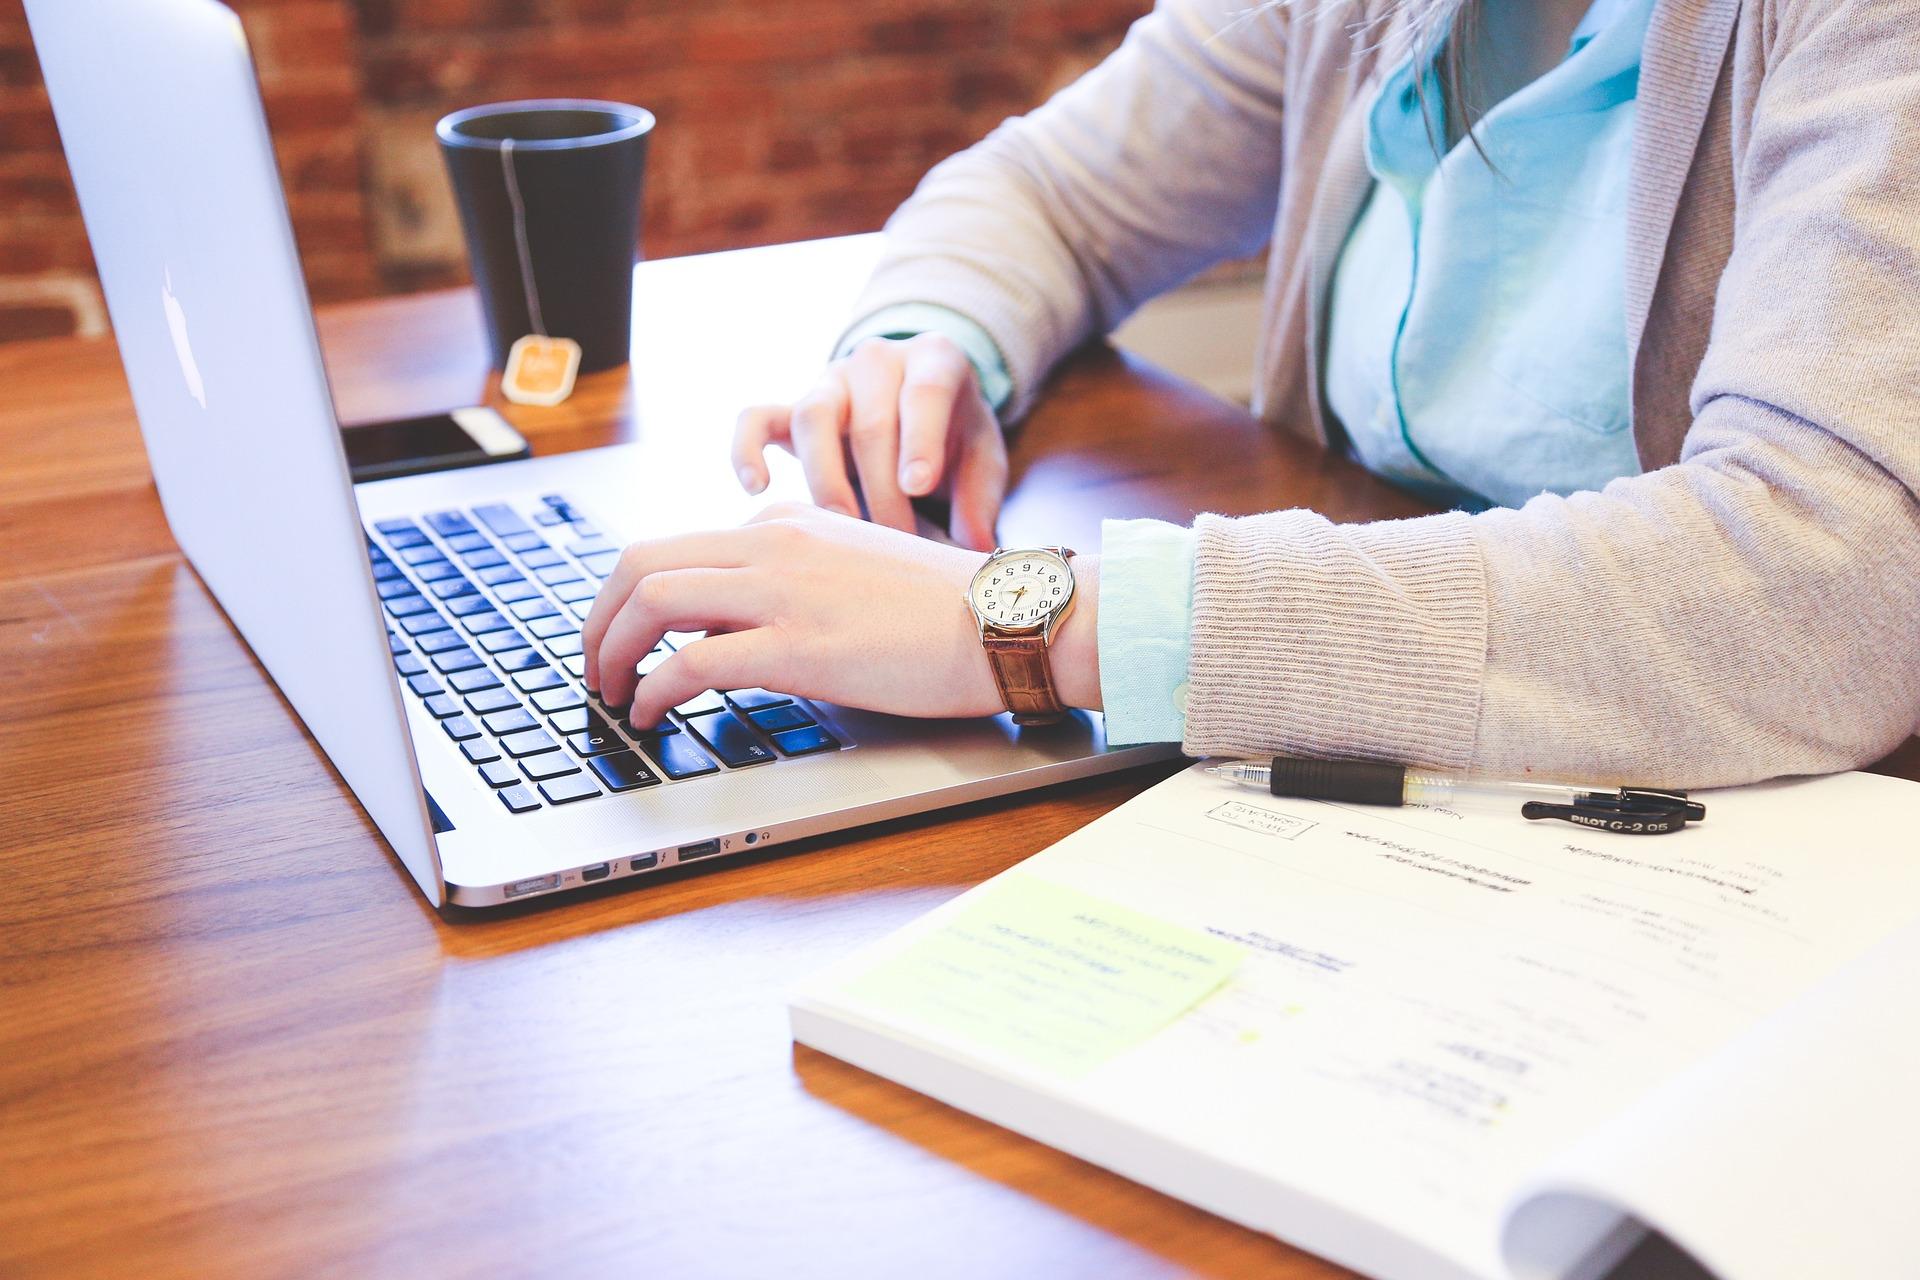 Web通の実践ウェブ文章術~ライティングの基本と紙媒体との違い~